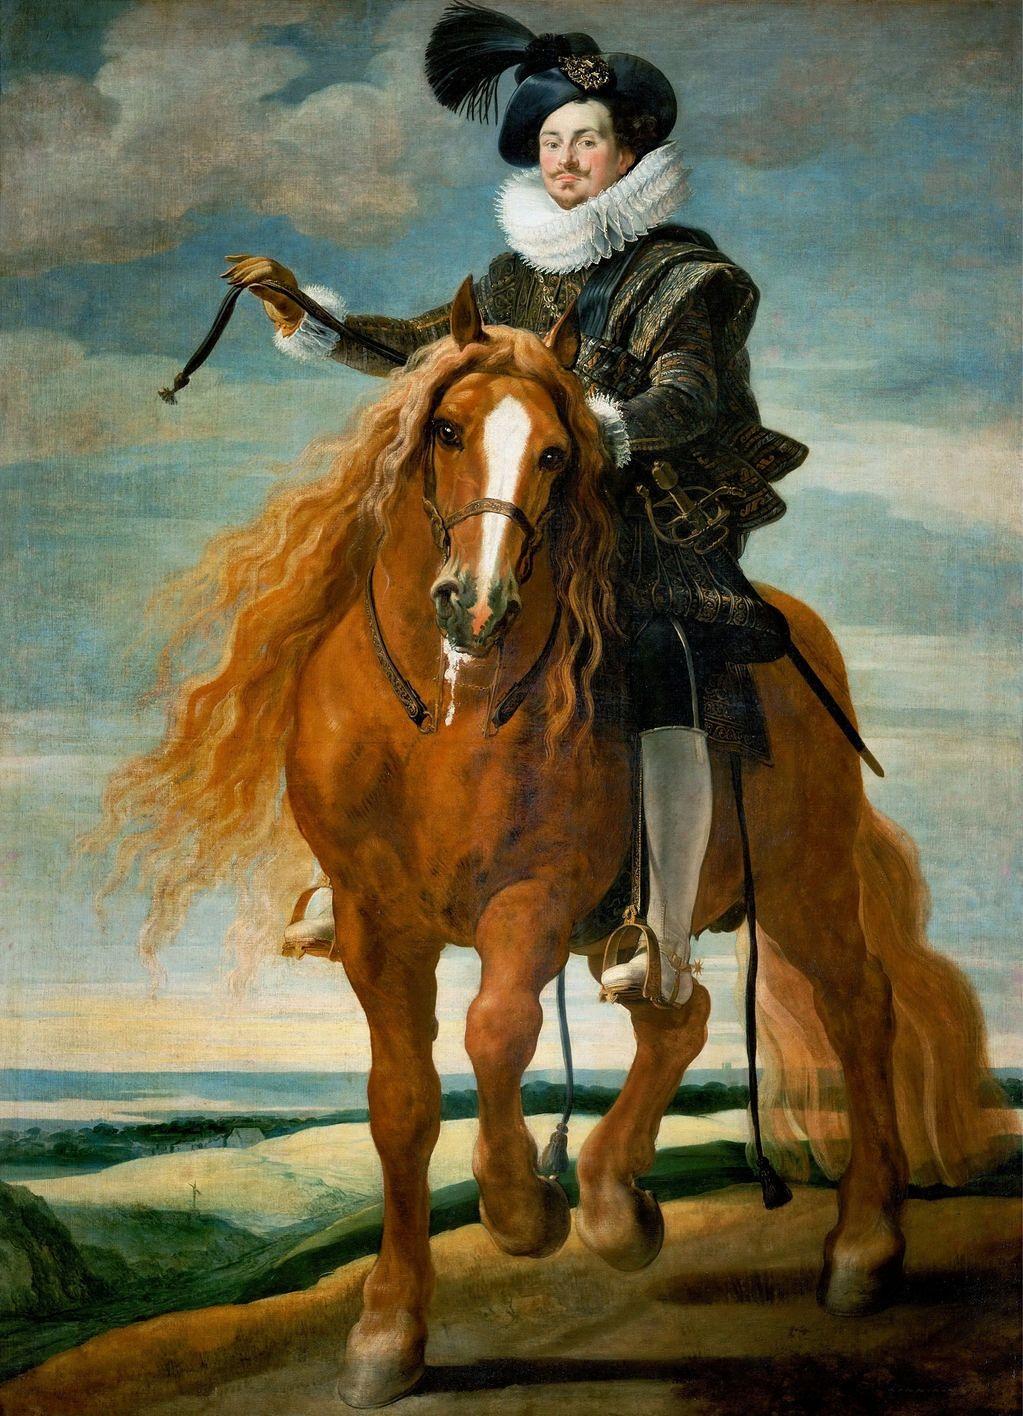 Gaspar de Crayer (1582-1669): Equestrian portrait of Don Diego Messia Felipe de Guzmán